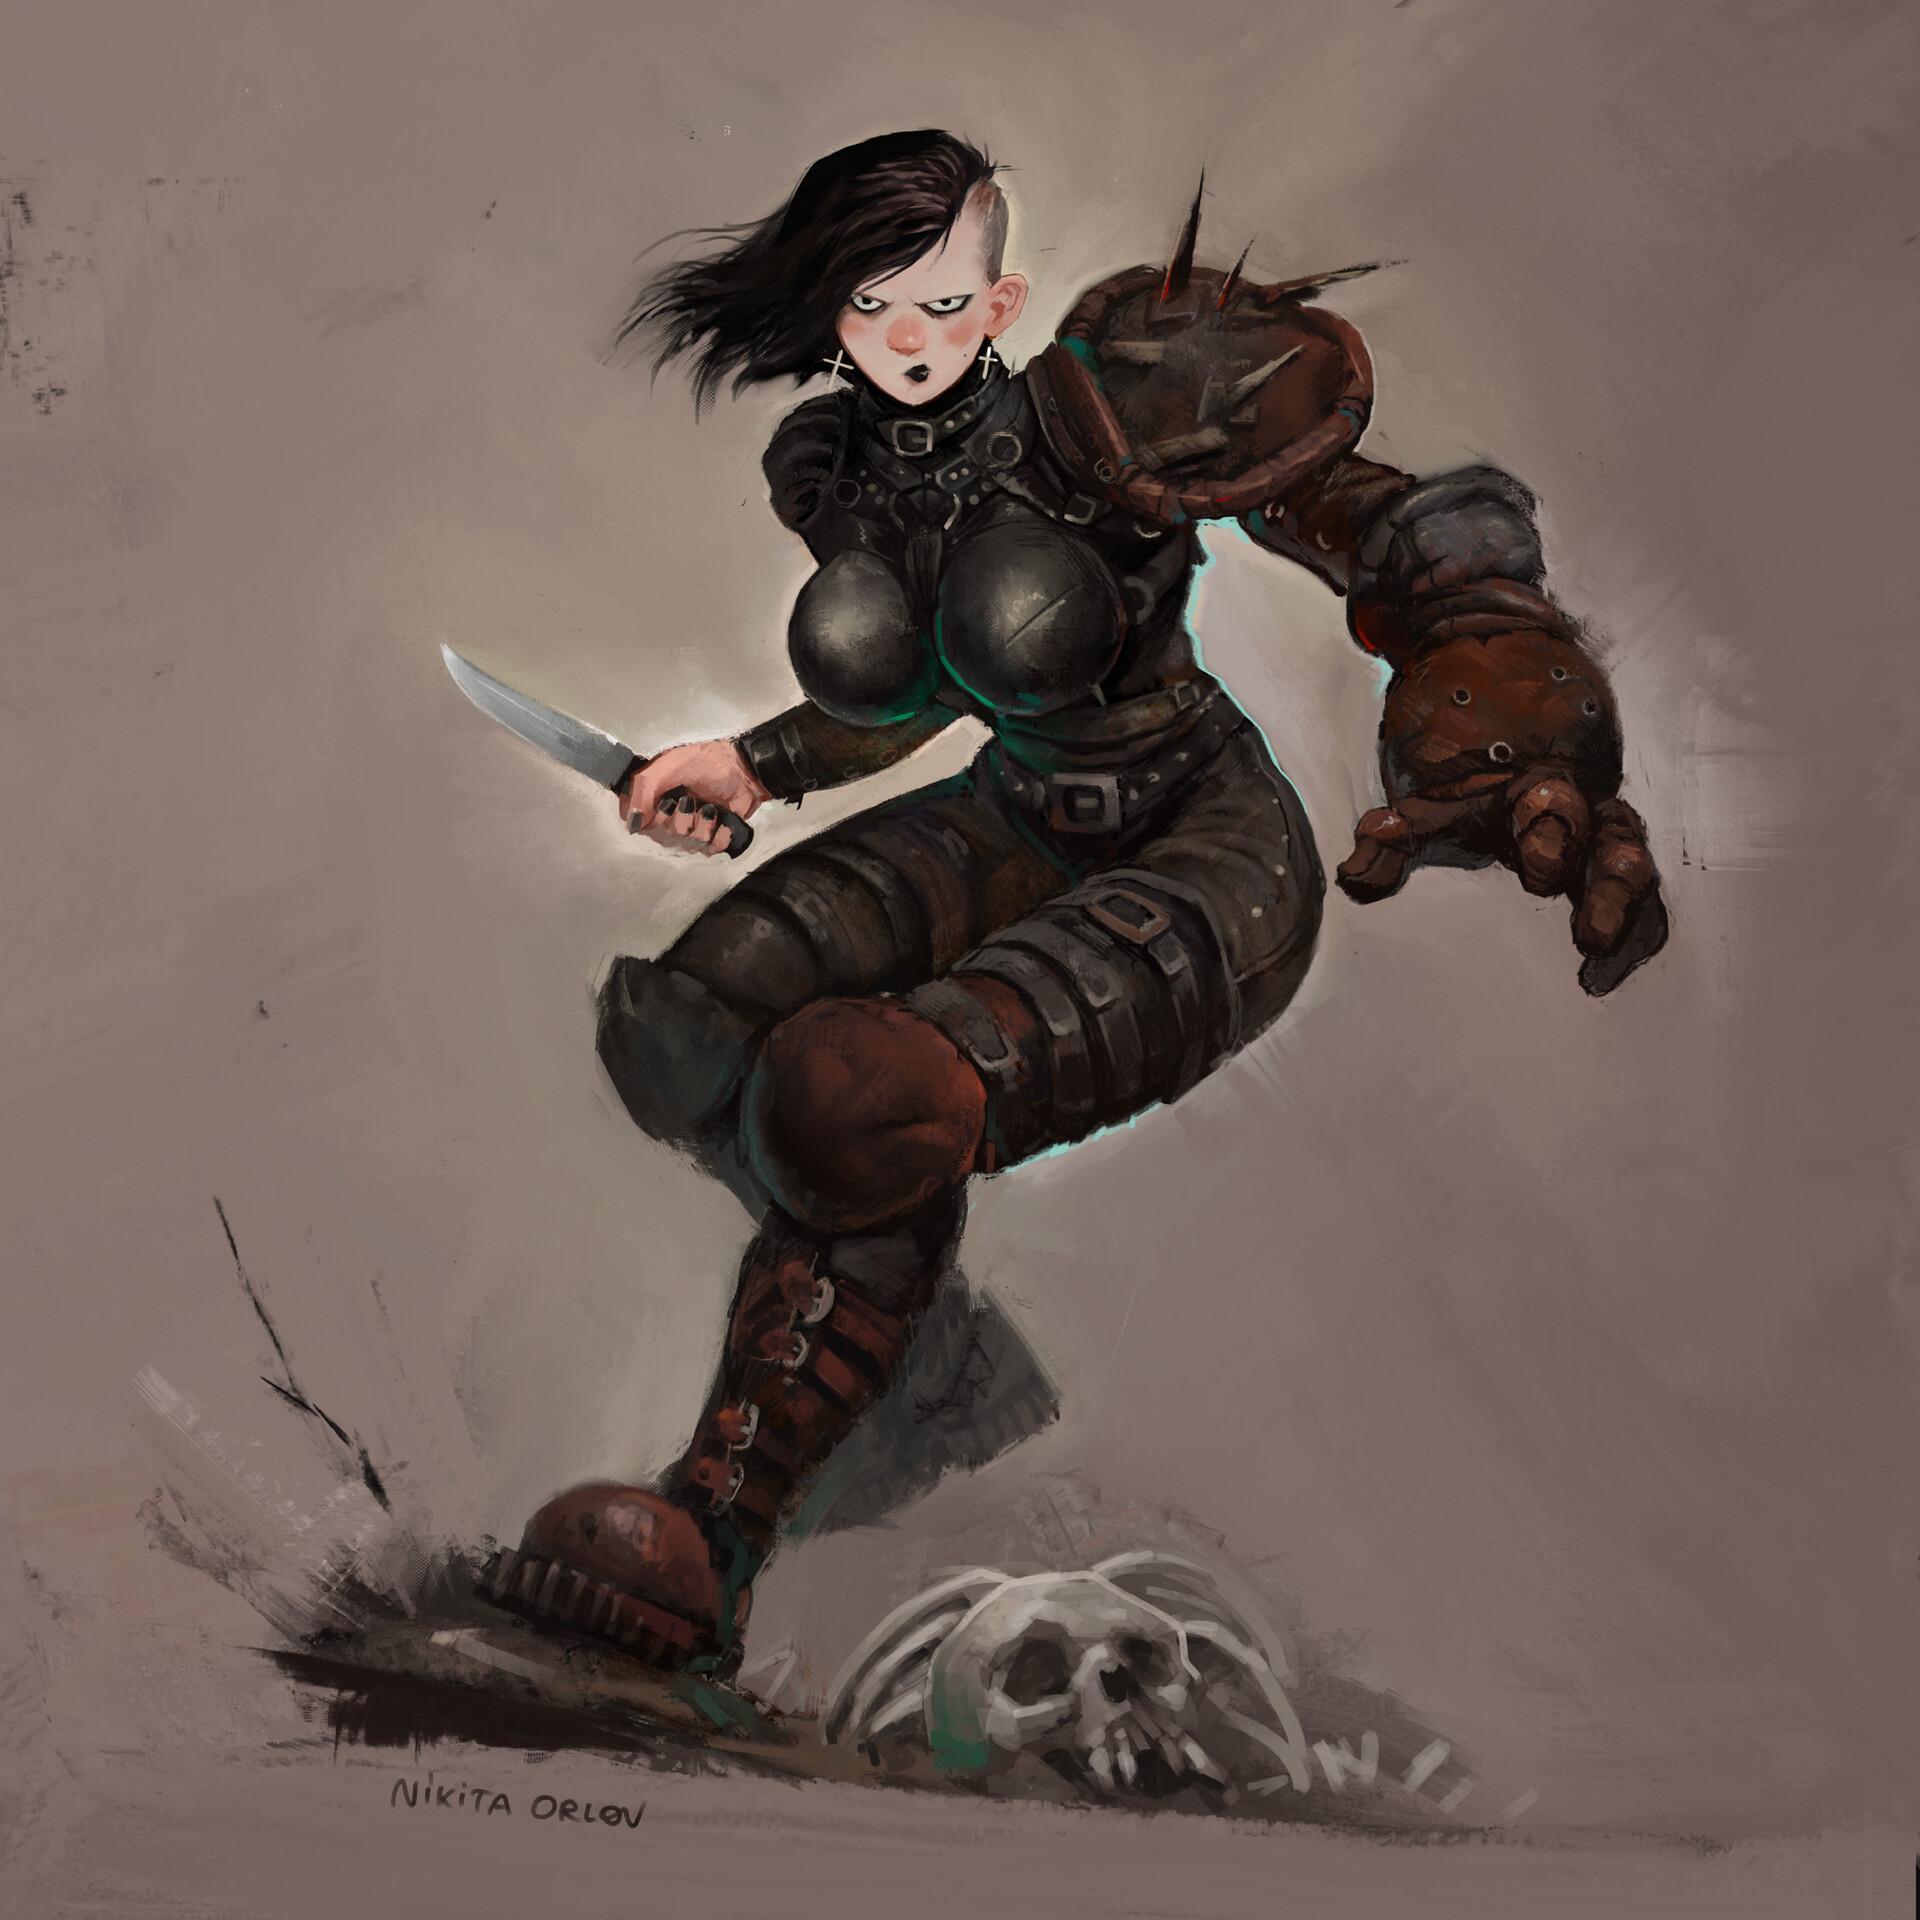 Nikita orlov battlegirls elvira